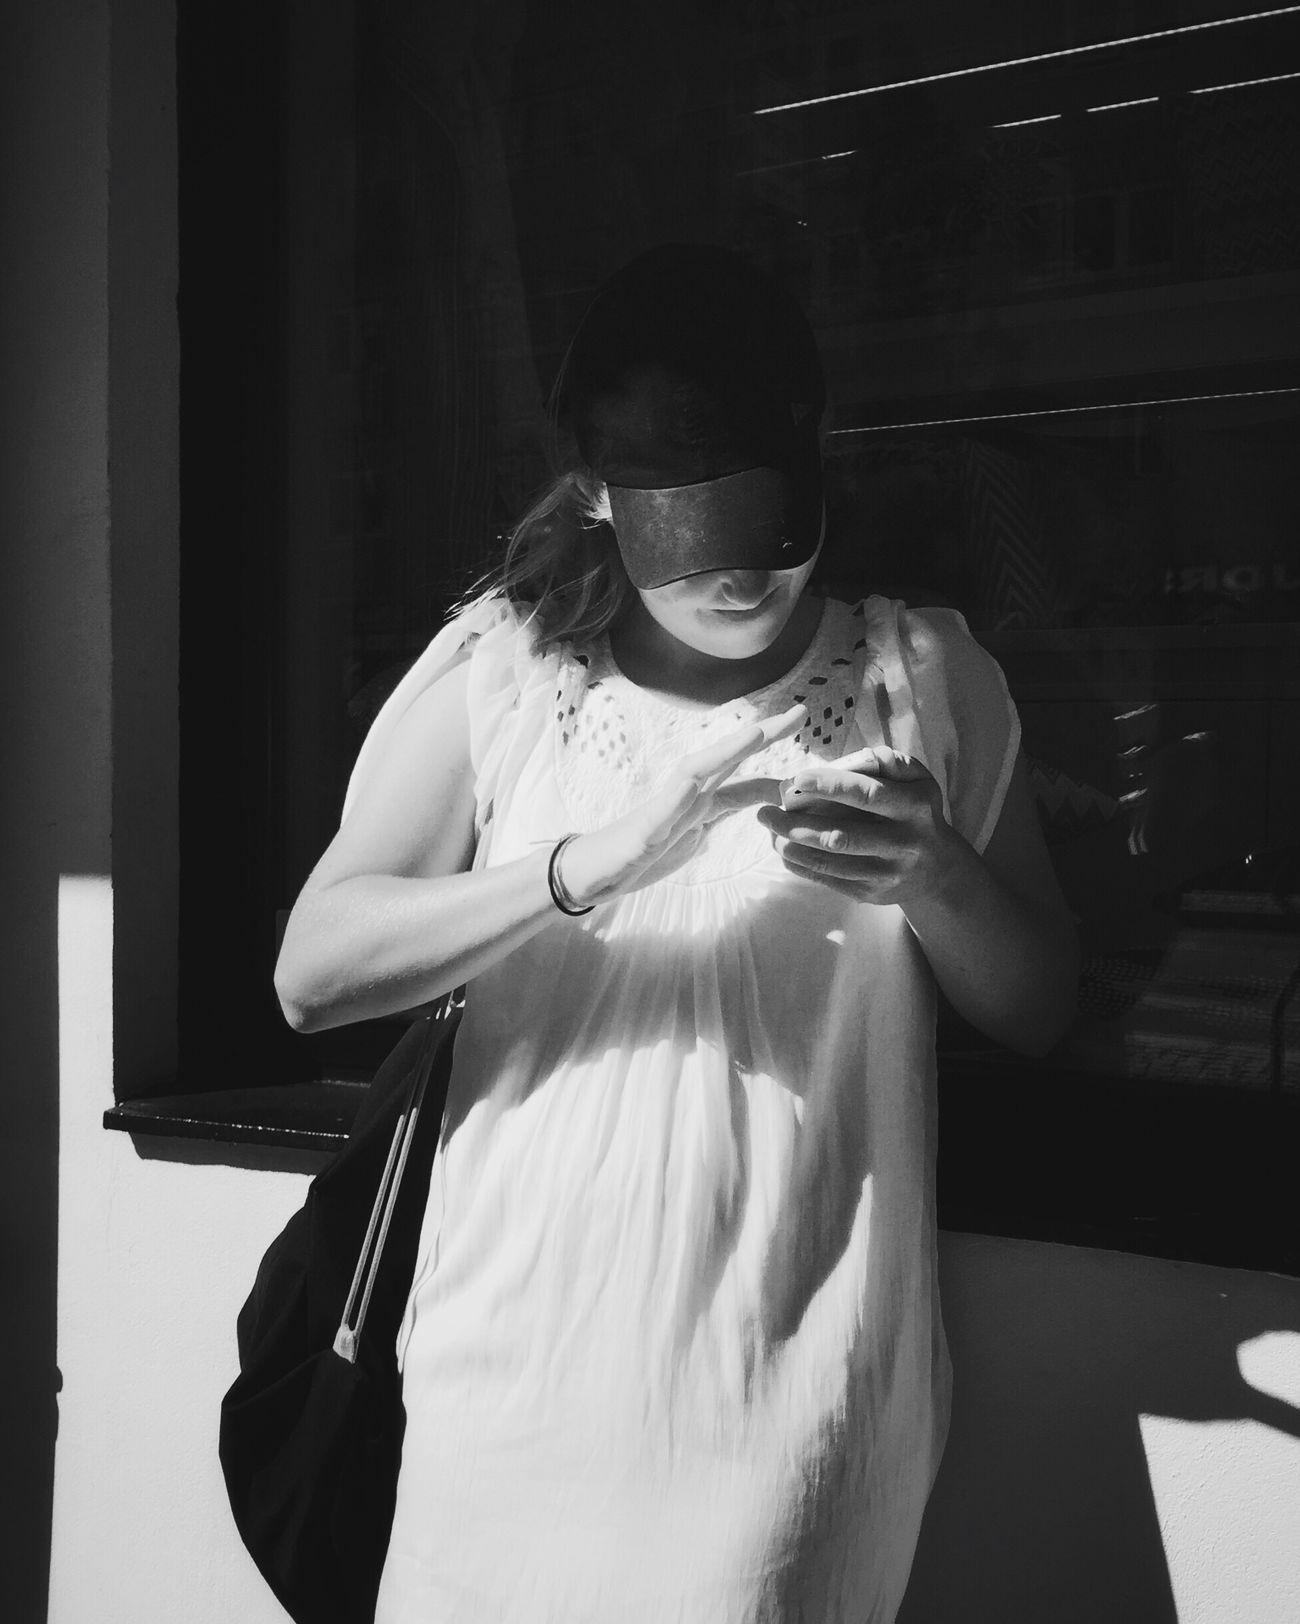 In depth • #oslostreets #streetphotography #mobilephotography #howardography #fotografhavardstorvestre #mobiography #streetbwcolor #streetsofoslo #gatefoto #gatefotografi